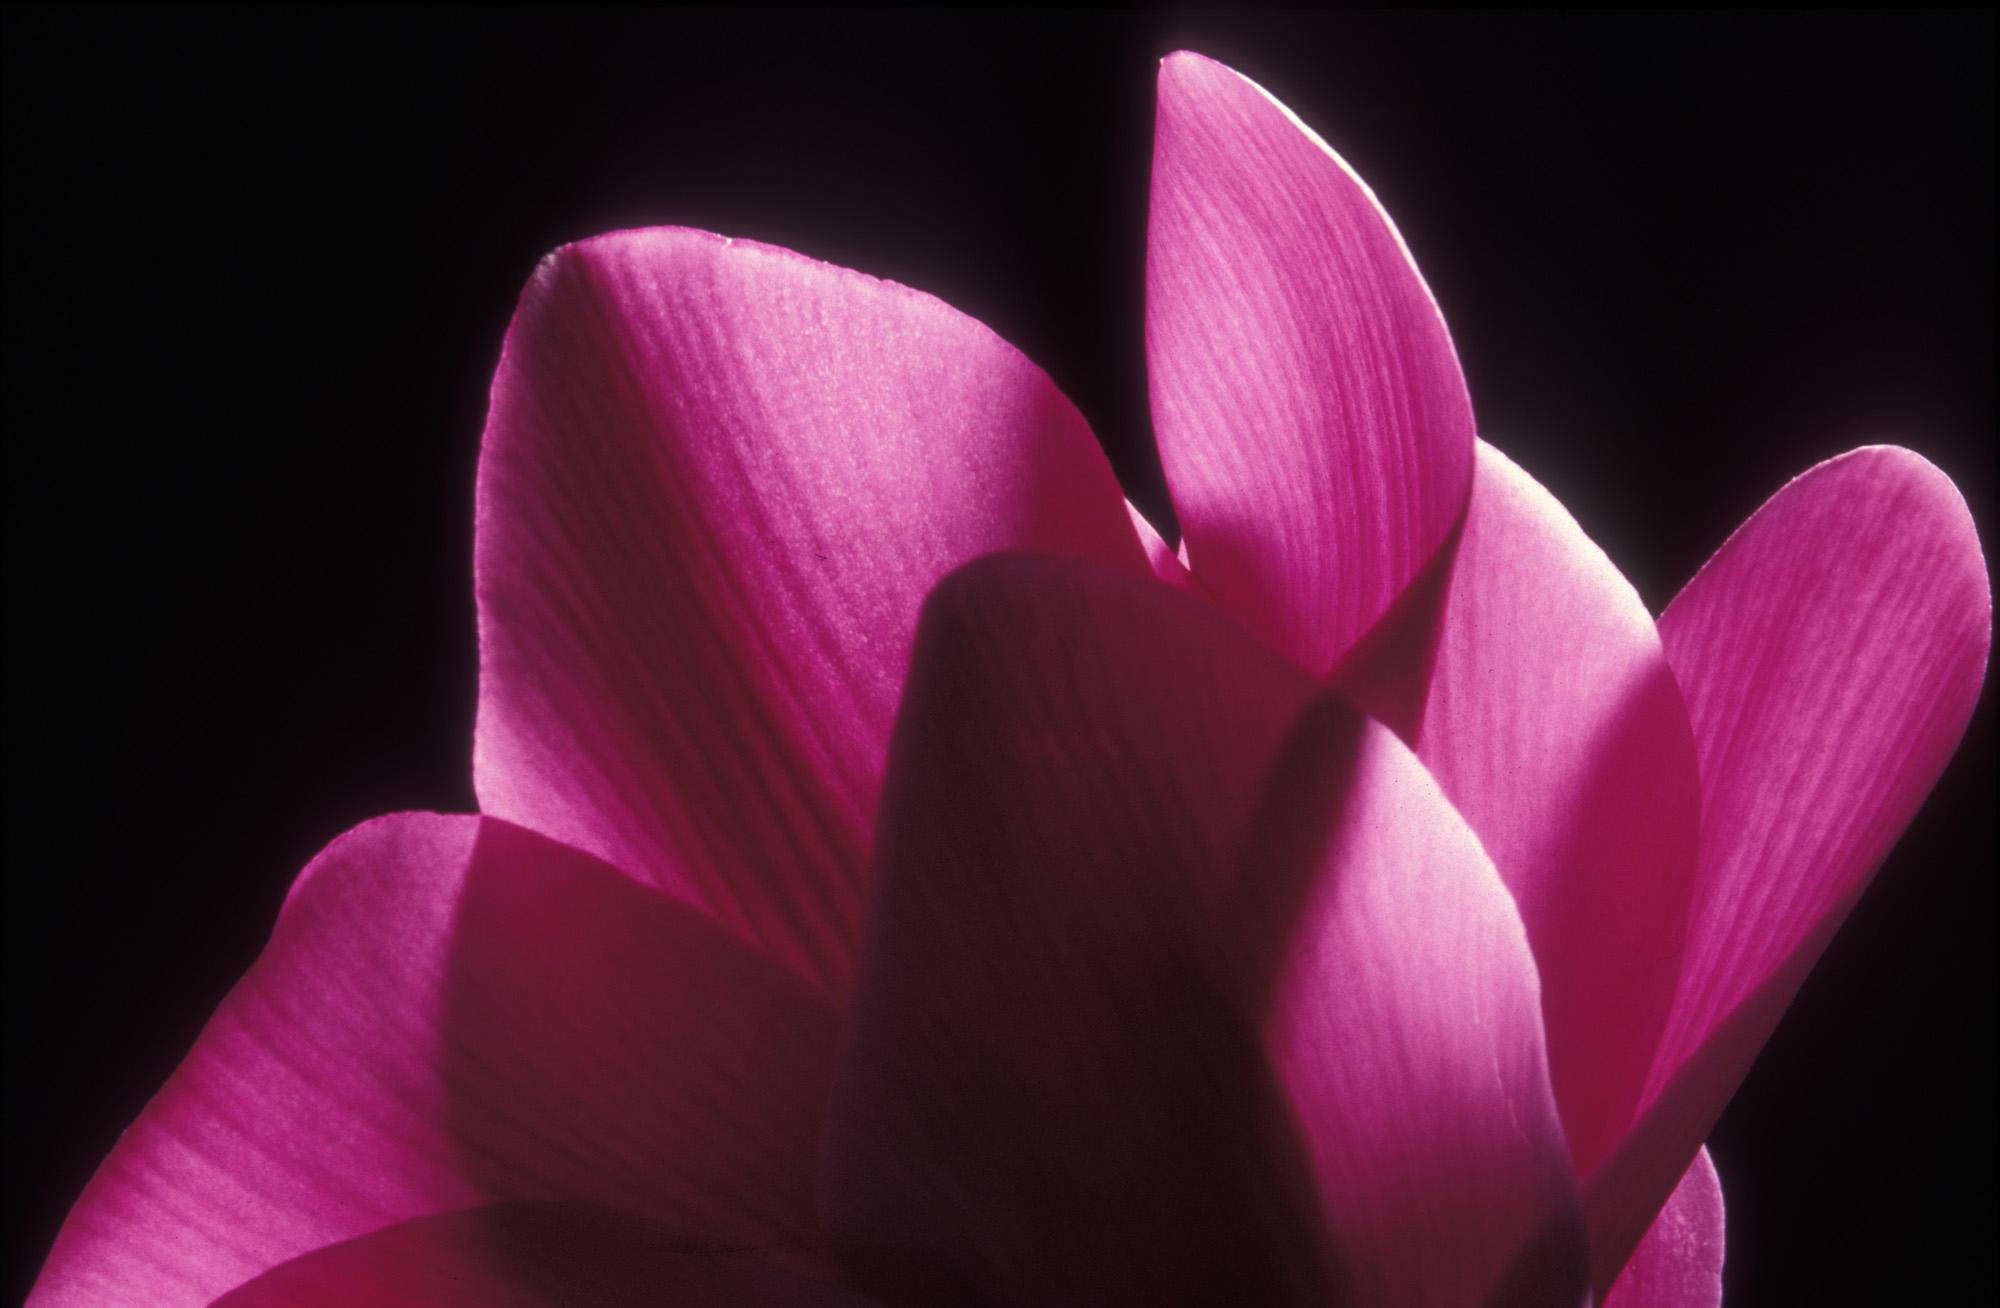 Blüte, Blüten, Pflanze, Pflanzen, Natur, Wachstum, Leben, Stempel, Blätter, Makrobereich, Makro, analog, Großformat, analoge Fotografie, Alpenveilchen, lila